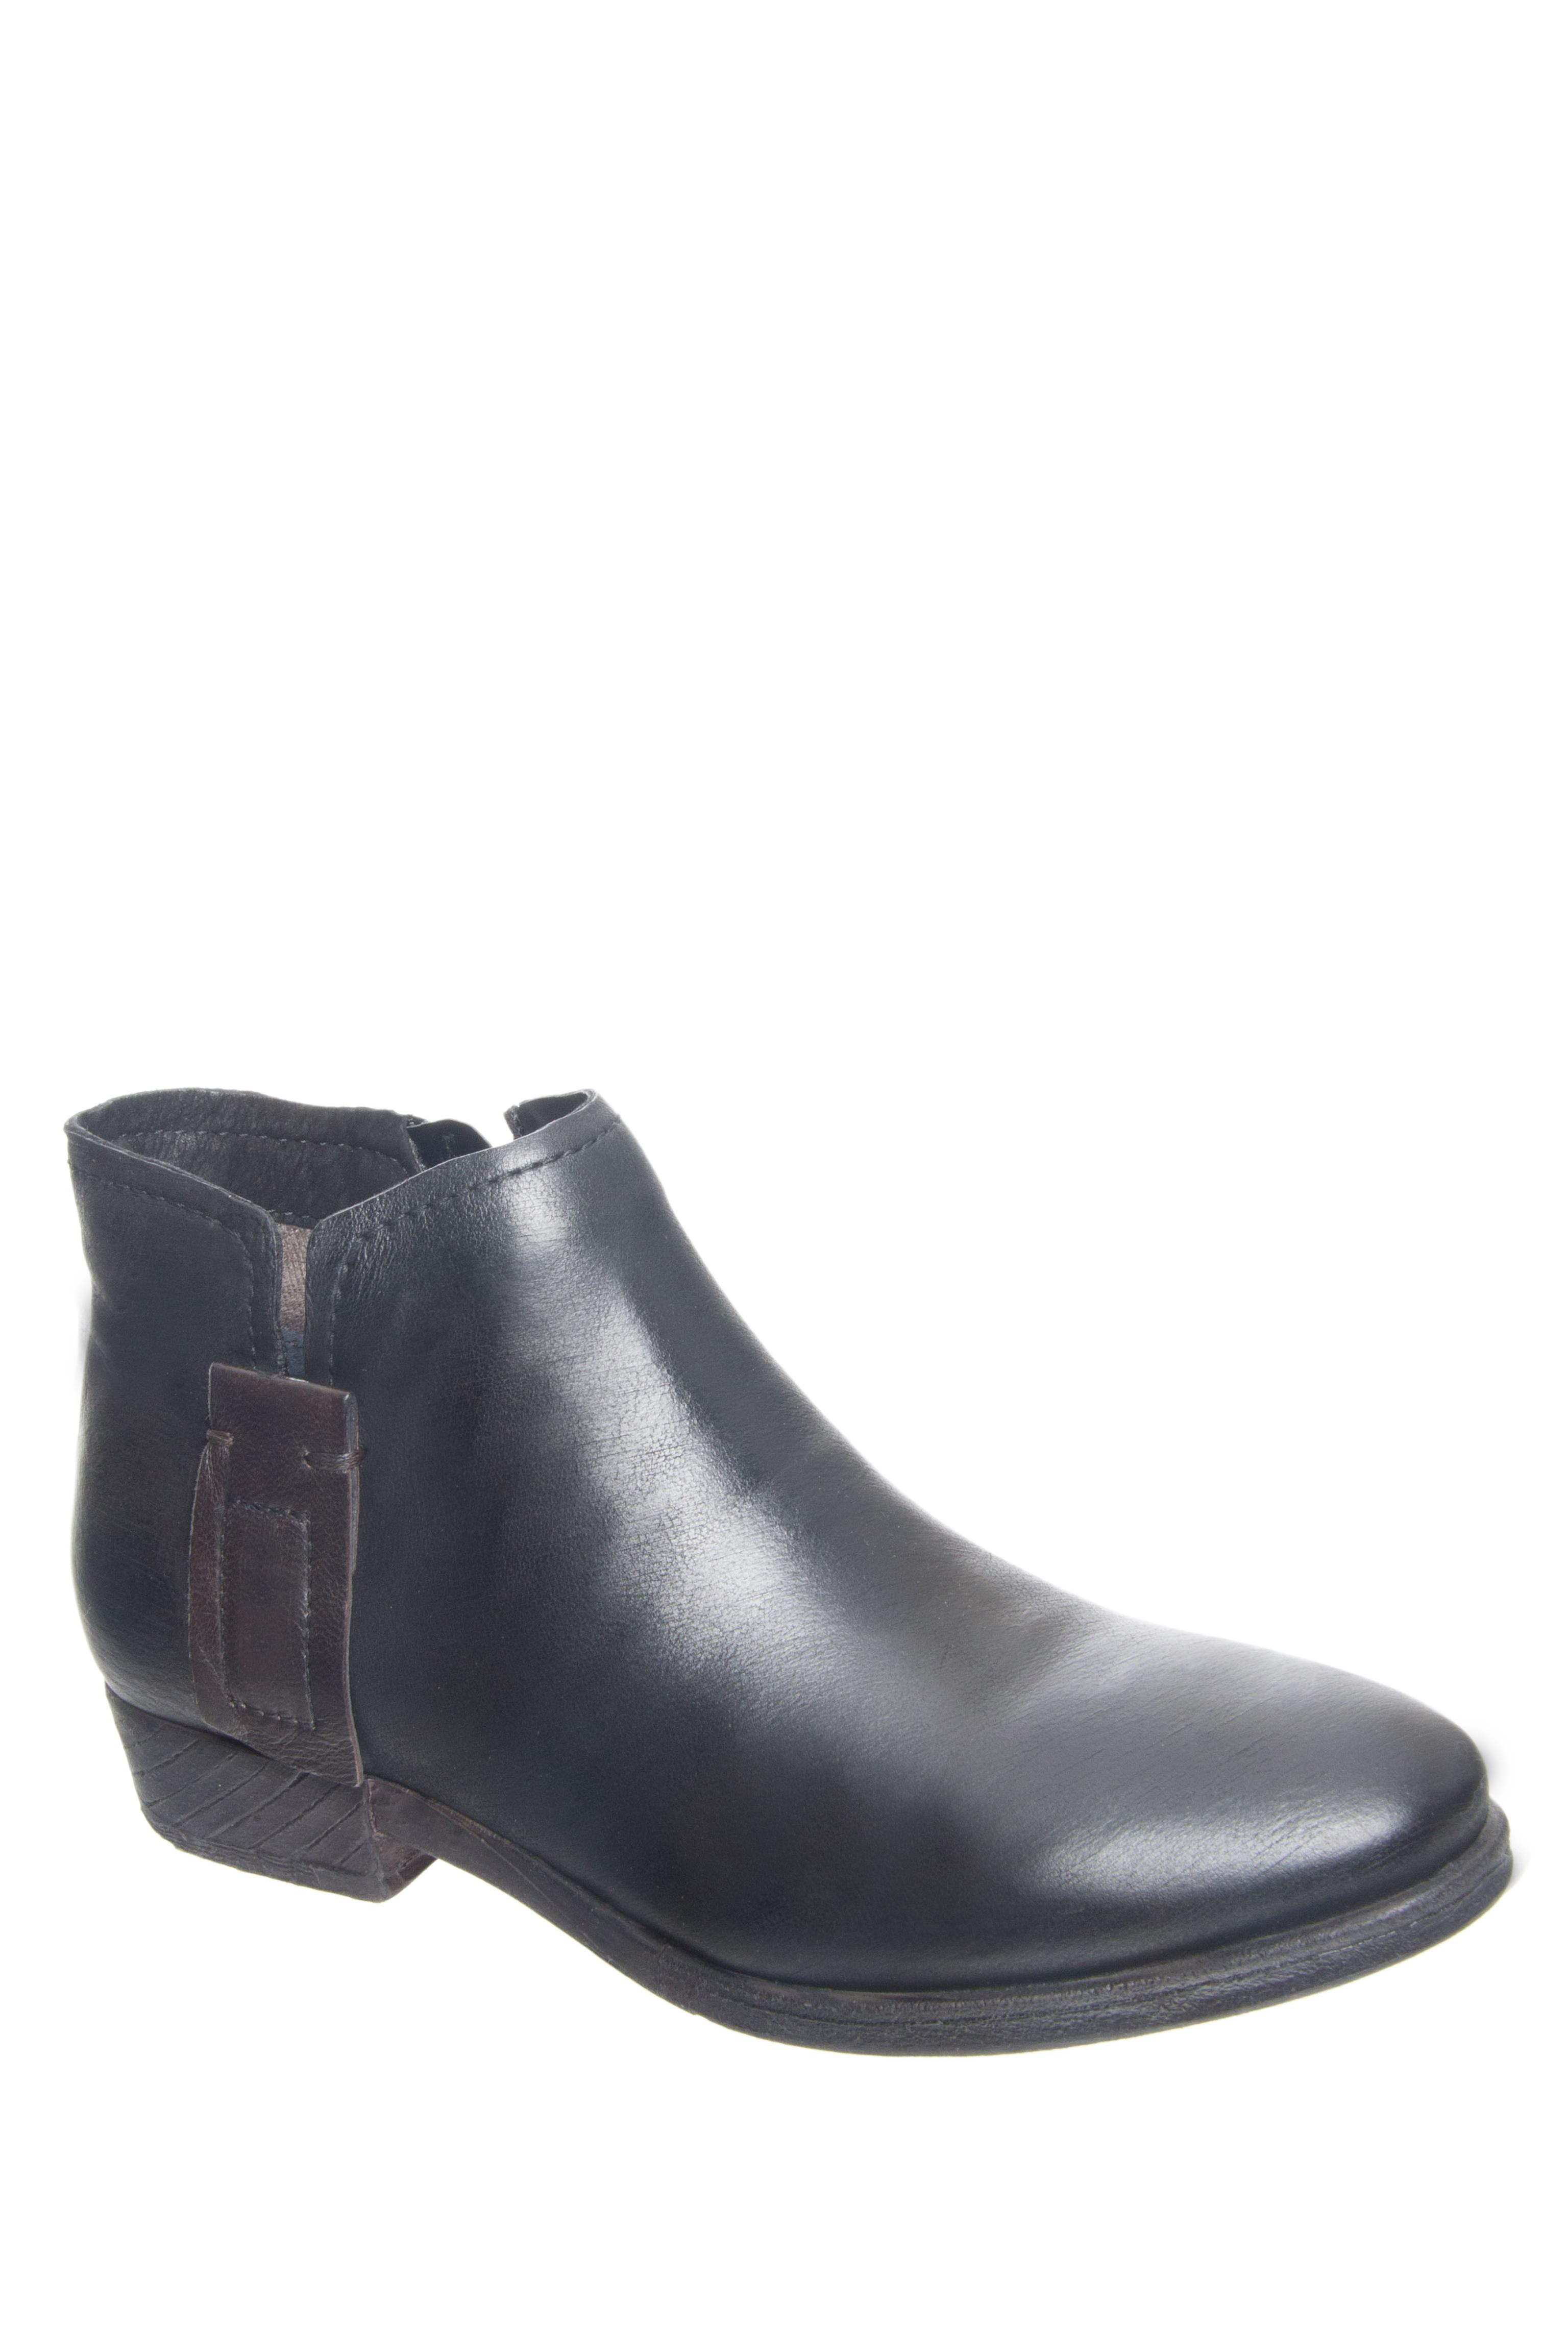 MIZ MOOZ Darius Low Heel Booties - Black